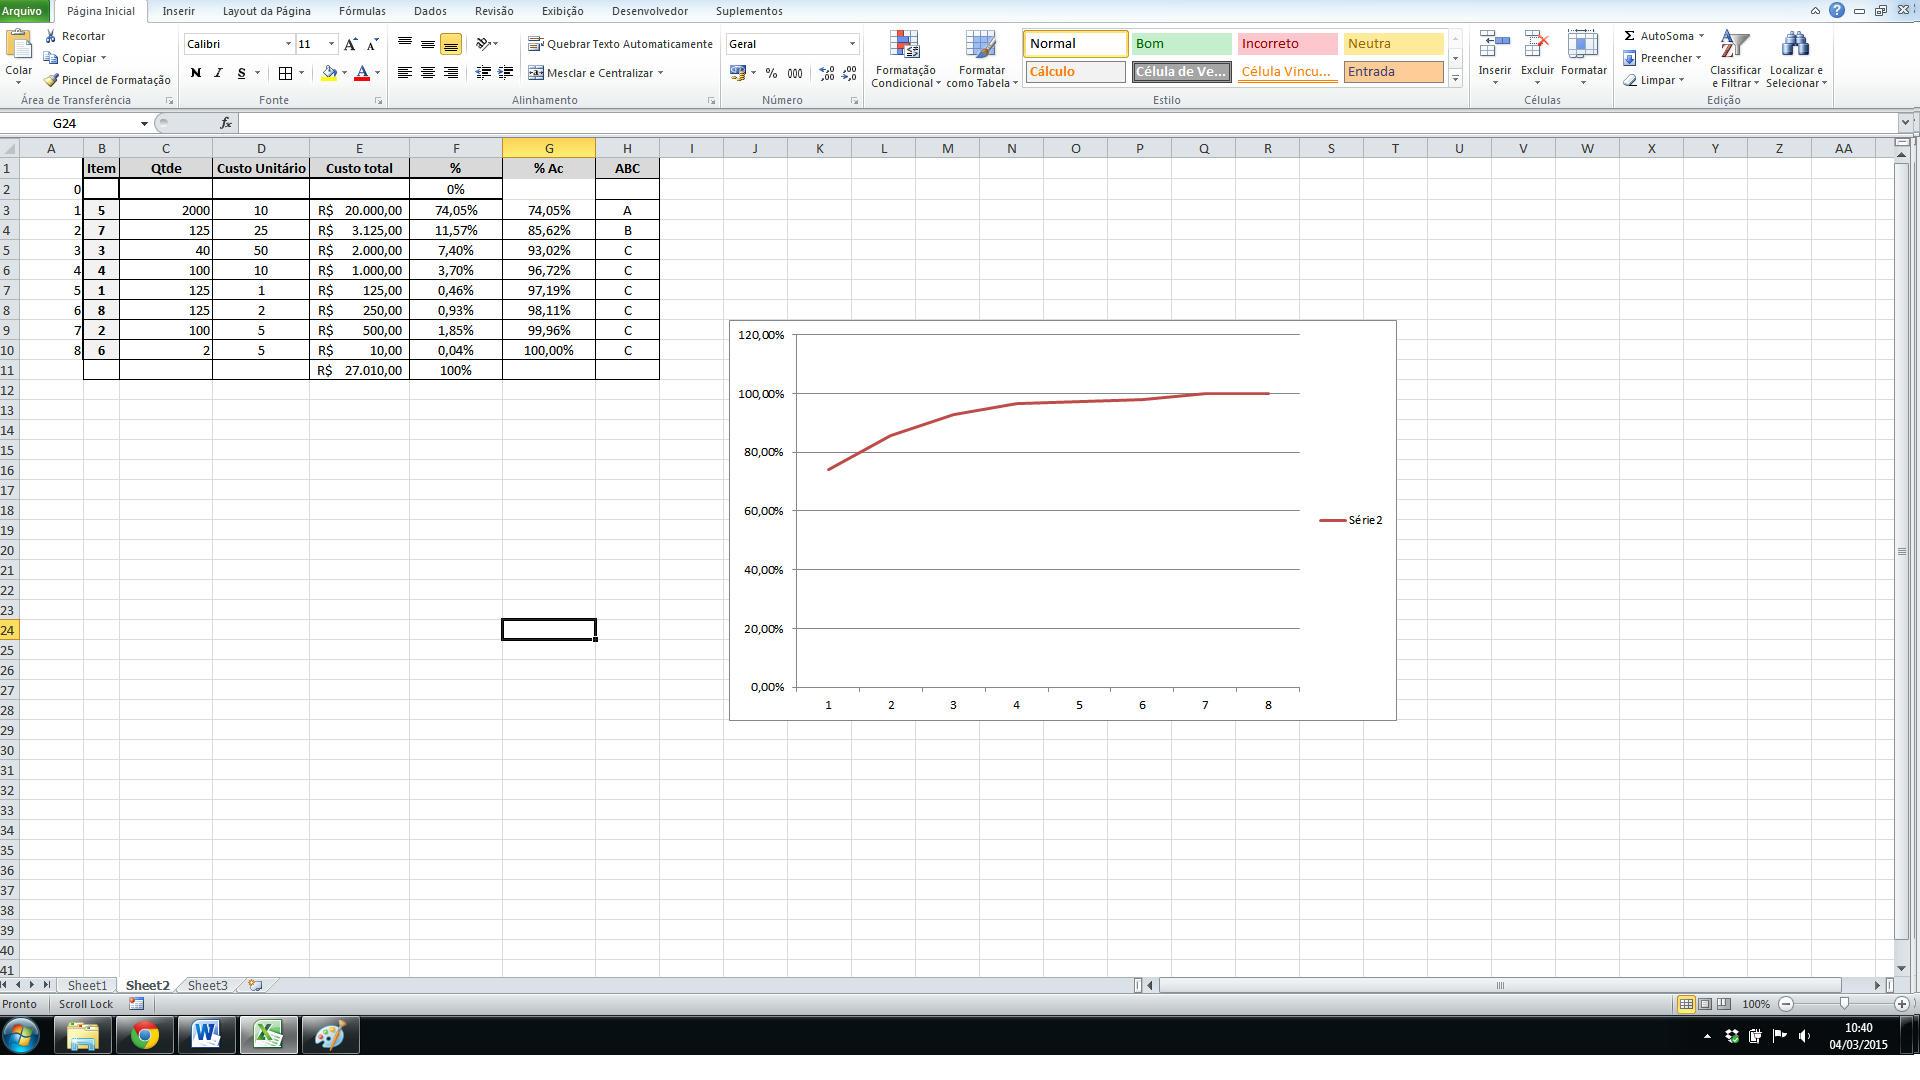 Curva ABC - Gráfico